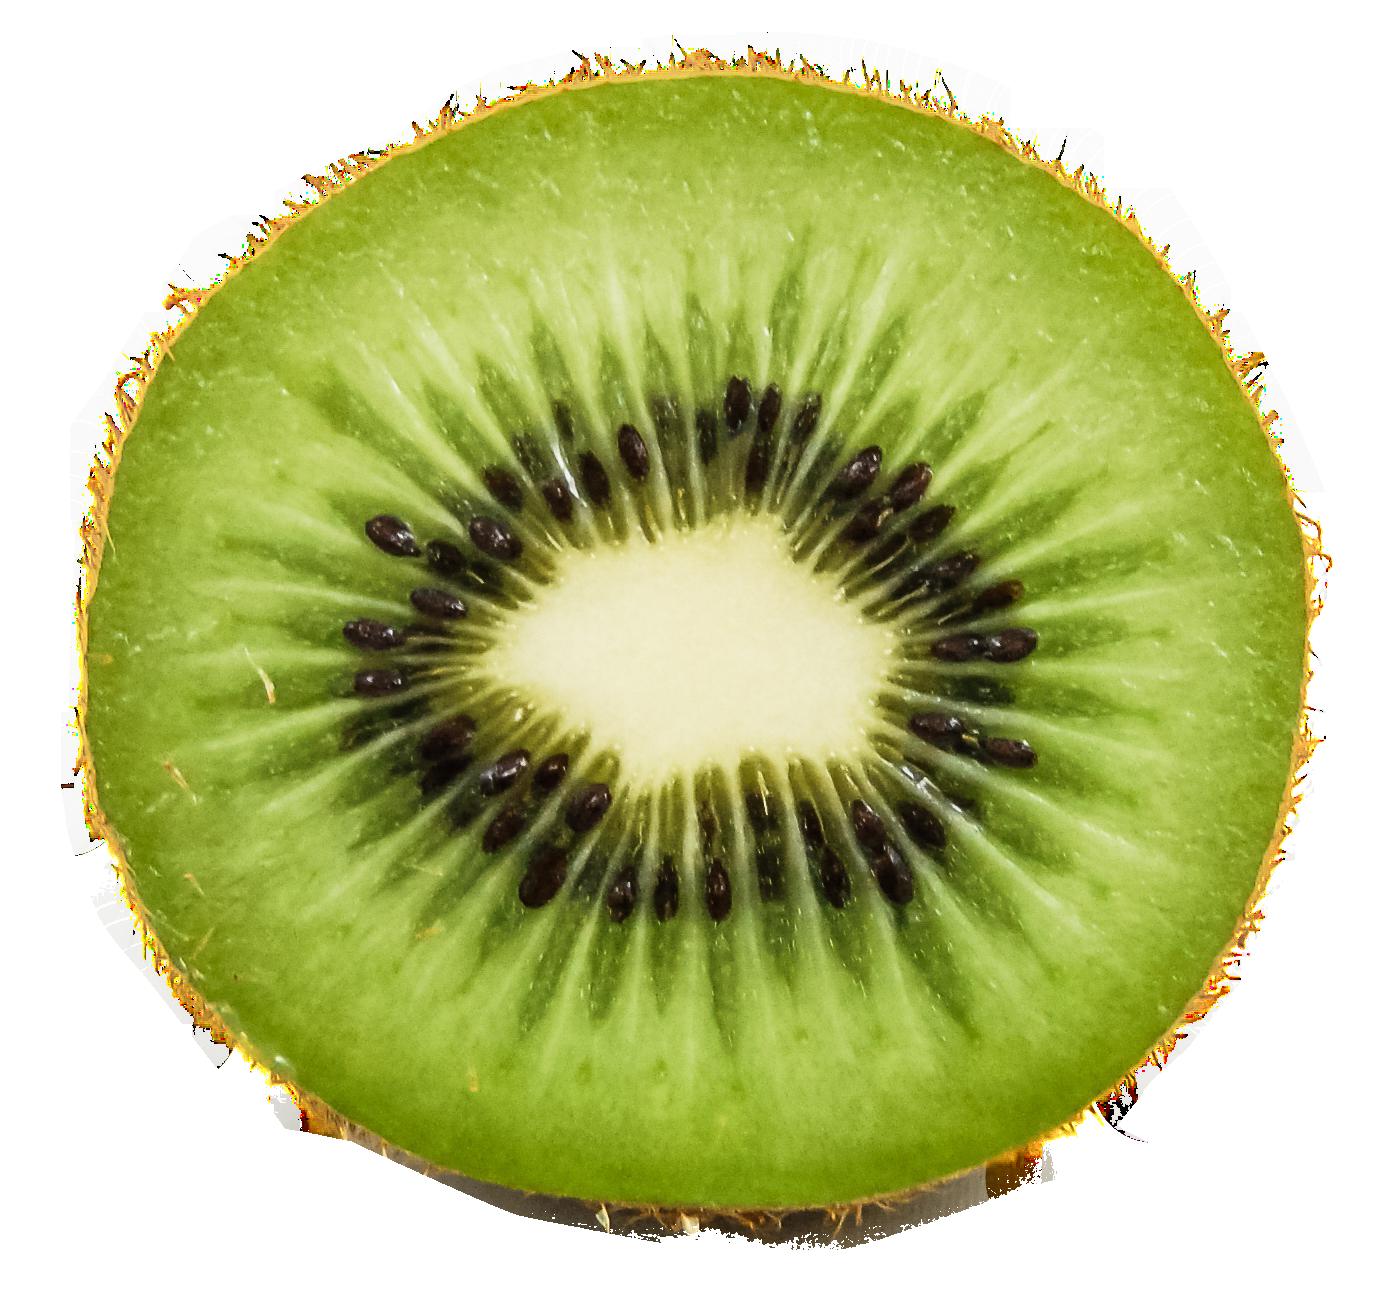 Kiwi clipart transparent background. Slice png images pluspng